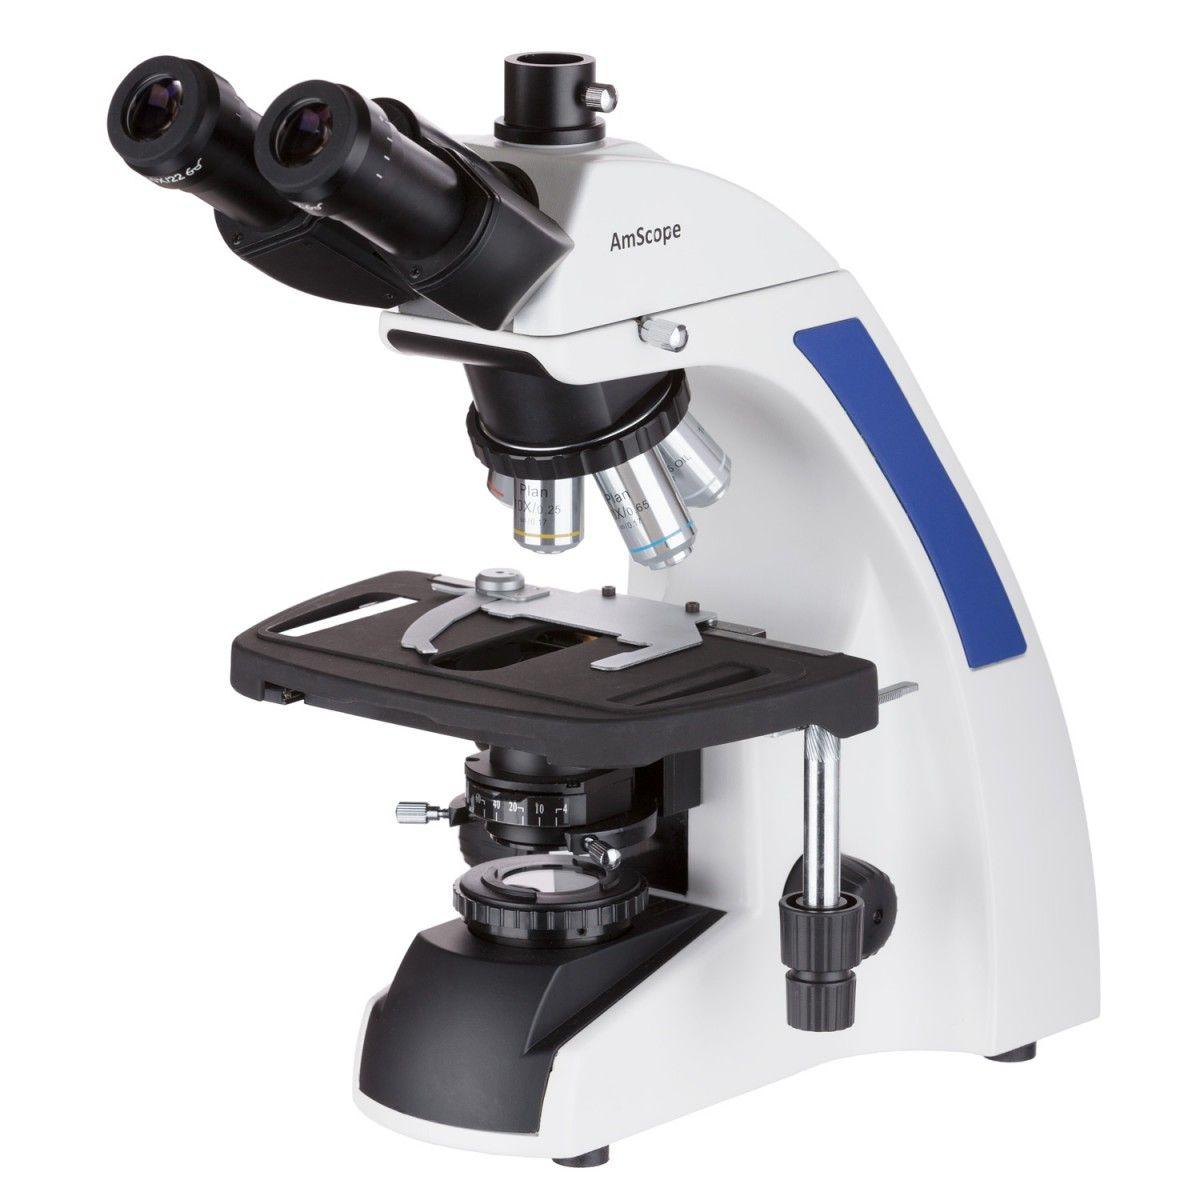 AmScope 40X-2500X Infinity Plan Laboratory Microscope